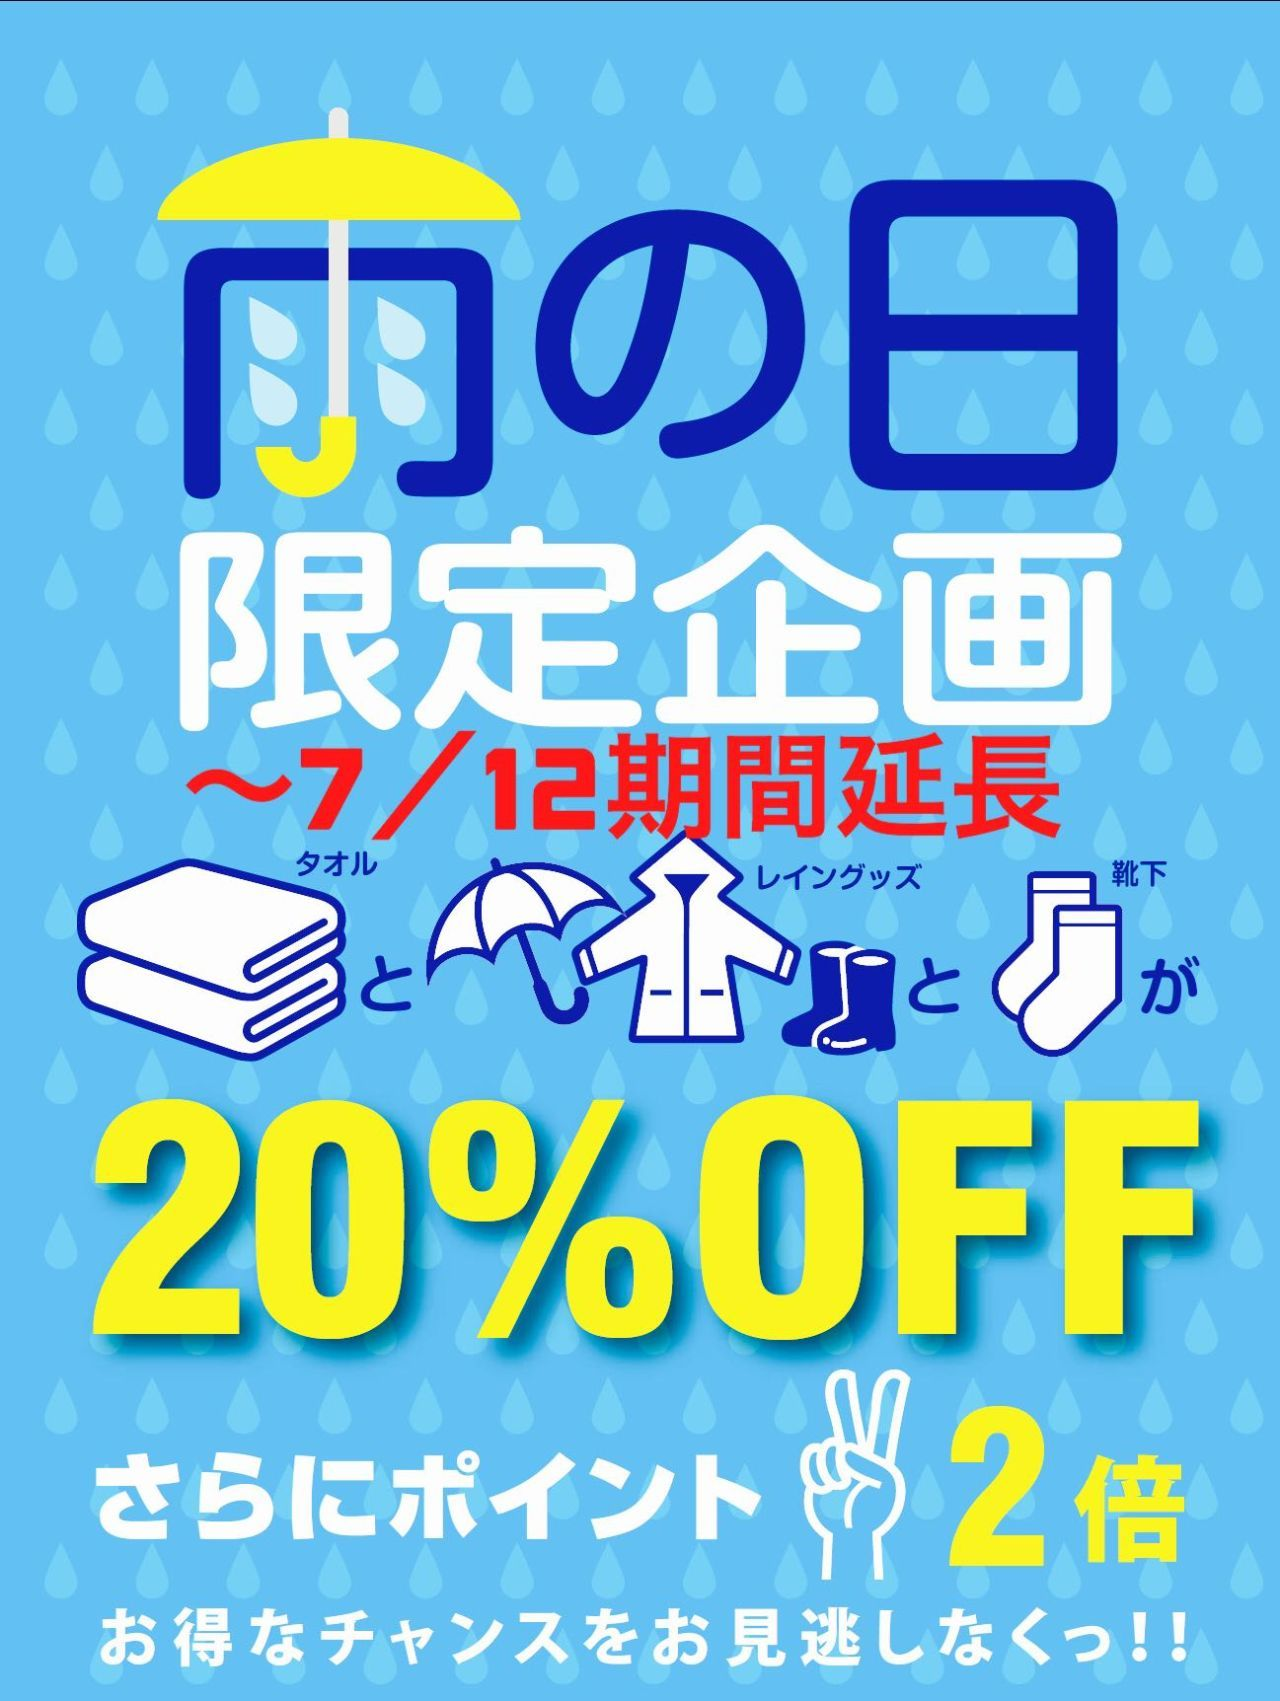 「【20%OFF】雨の日限定キャンペーン【期間延長】」の写真